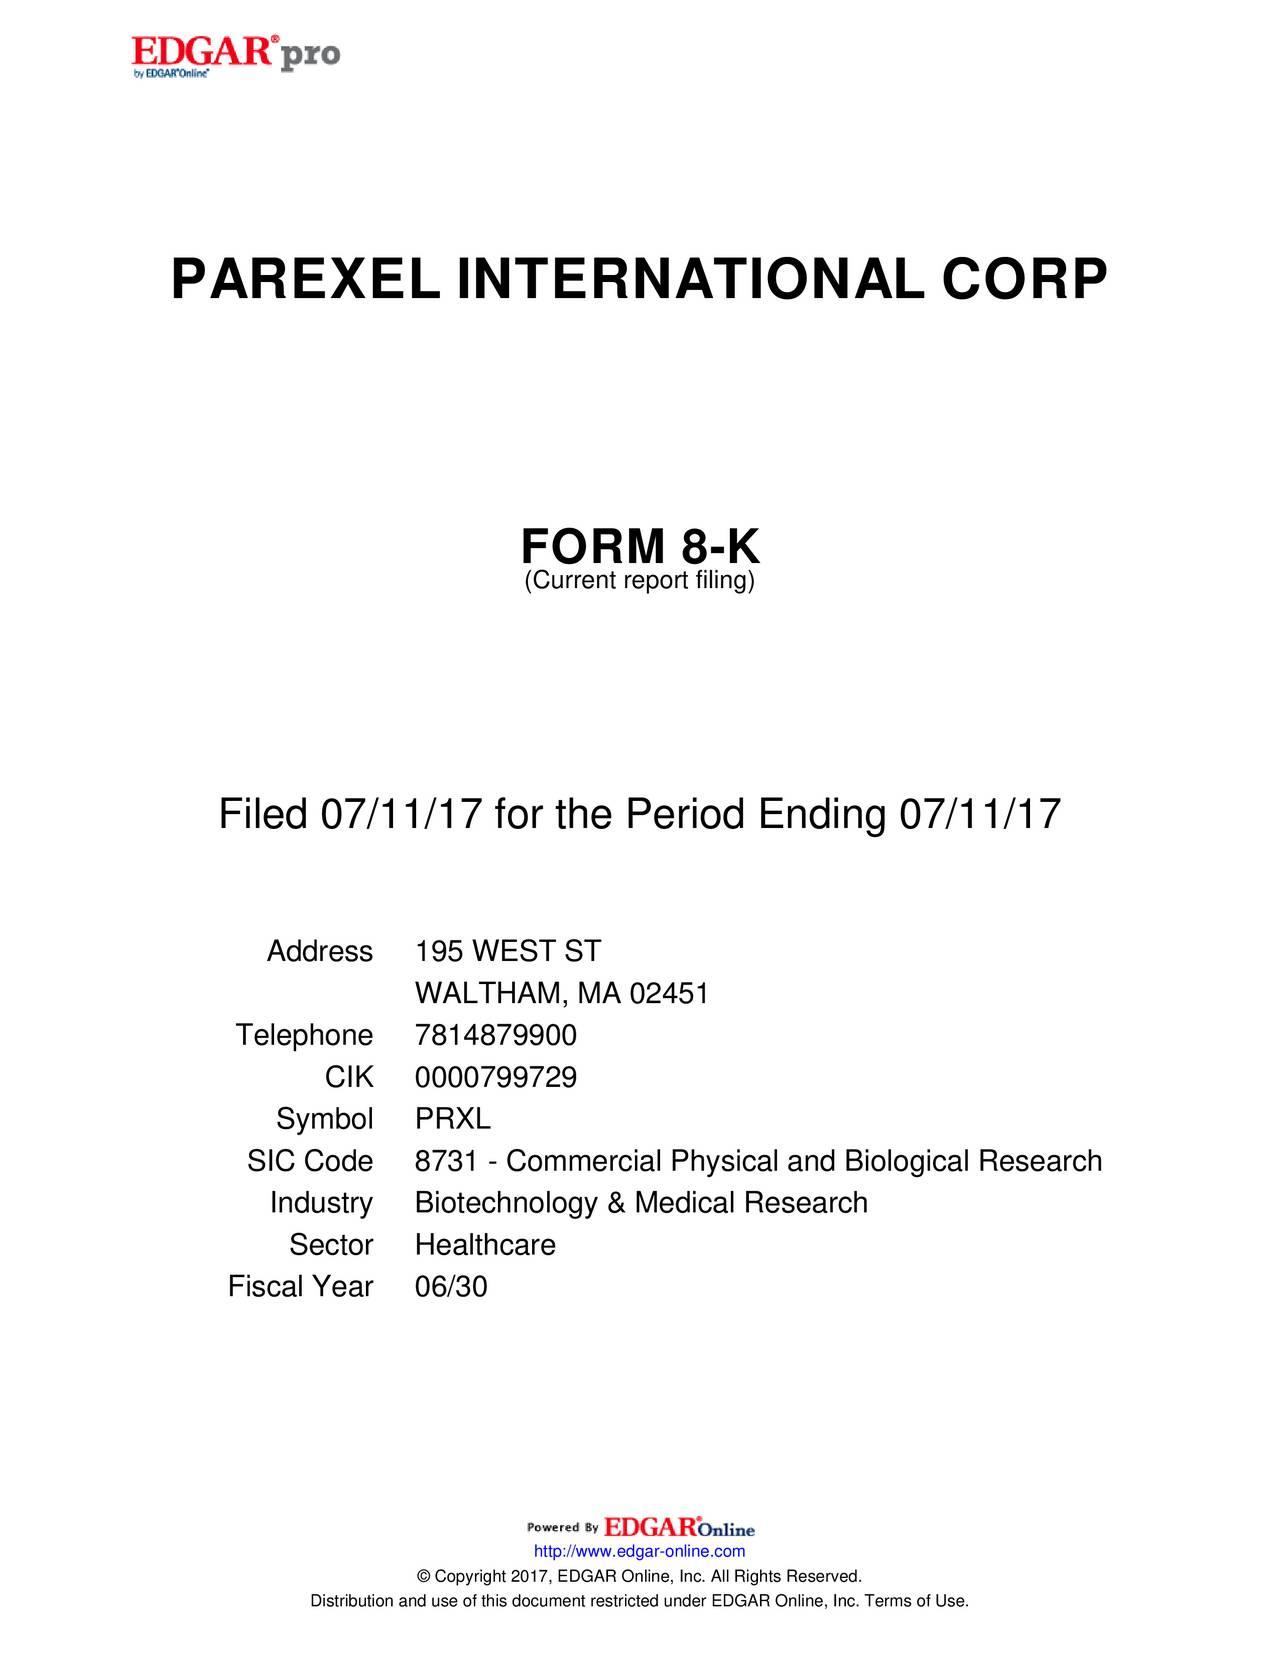 parexel international